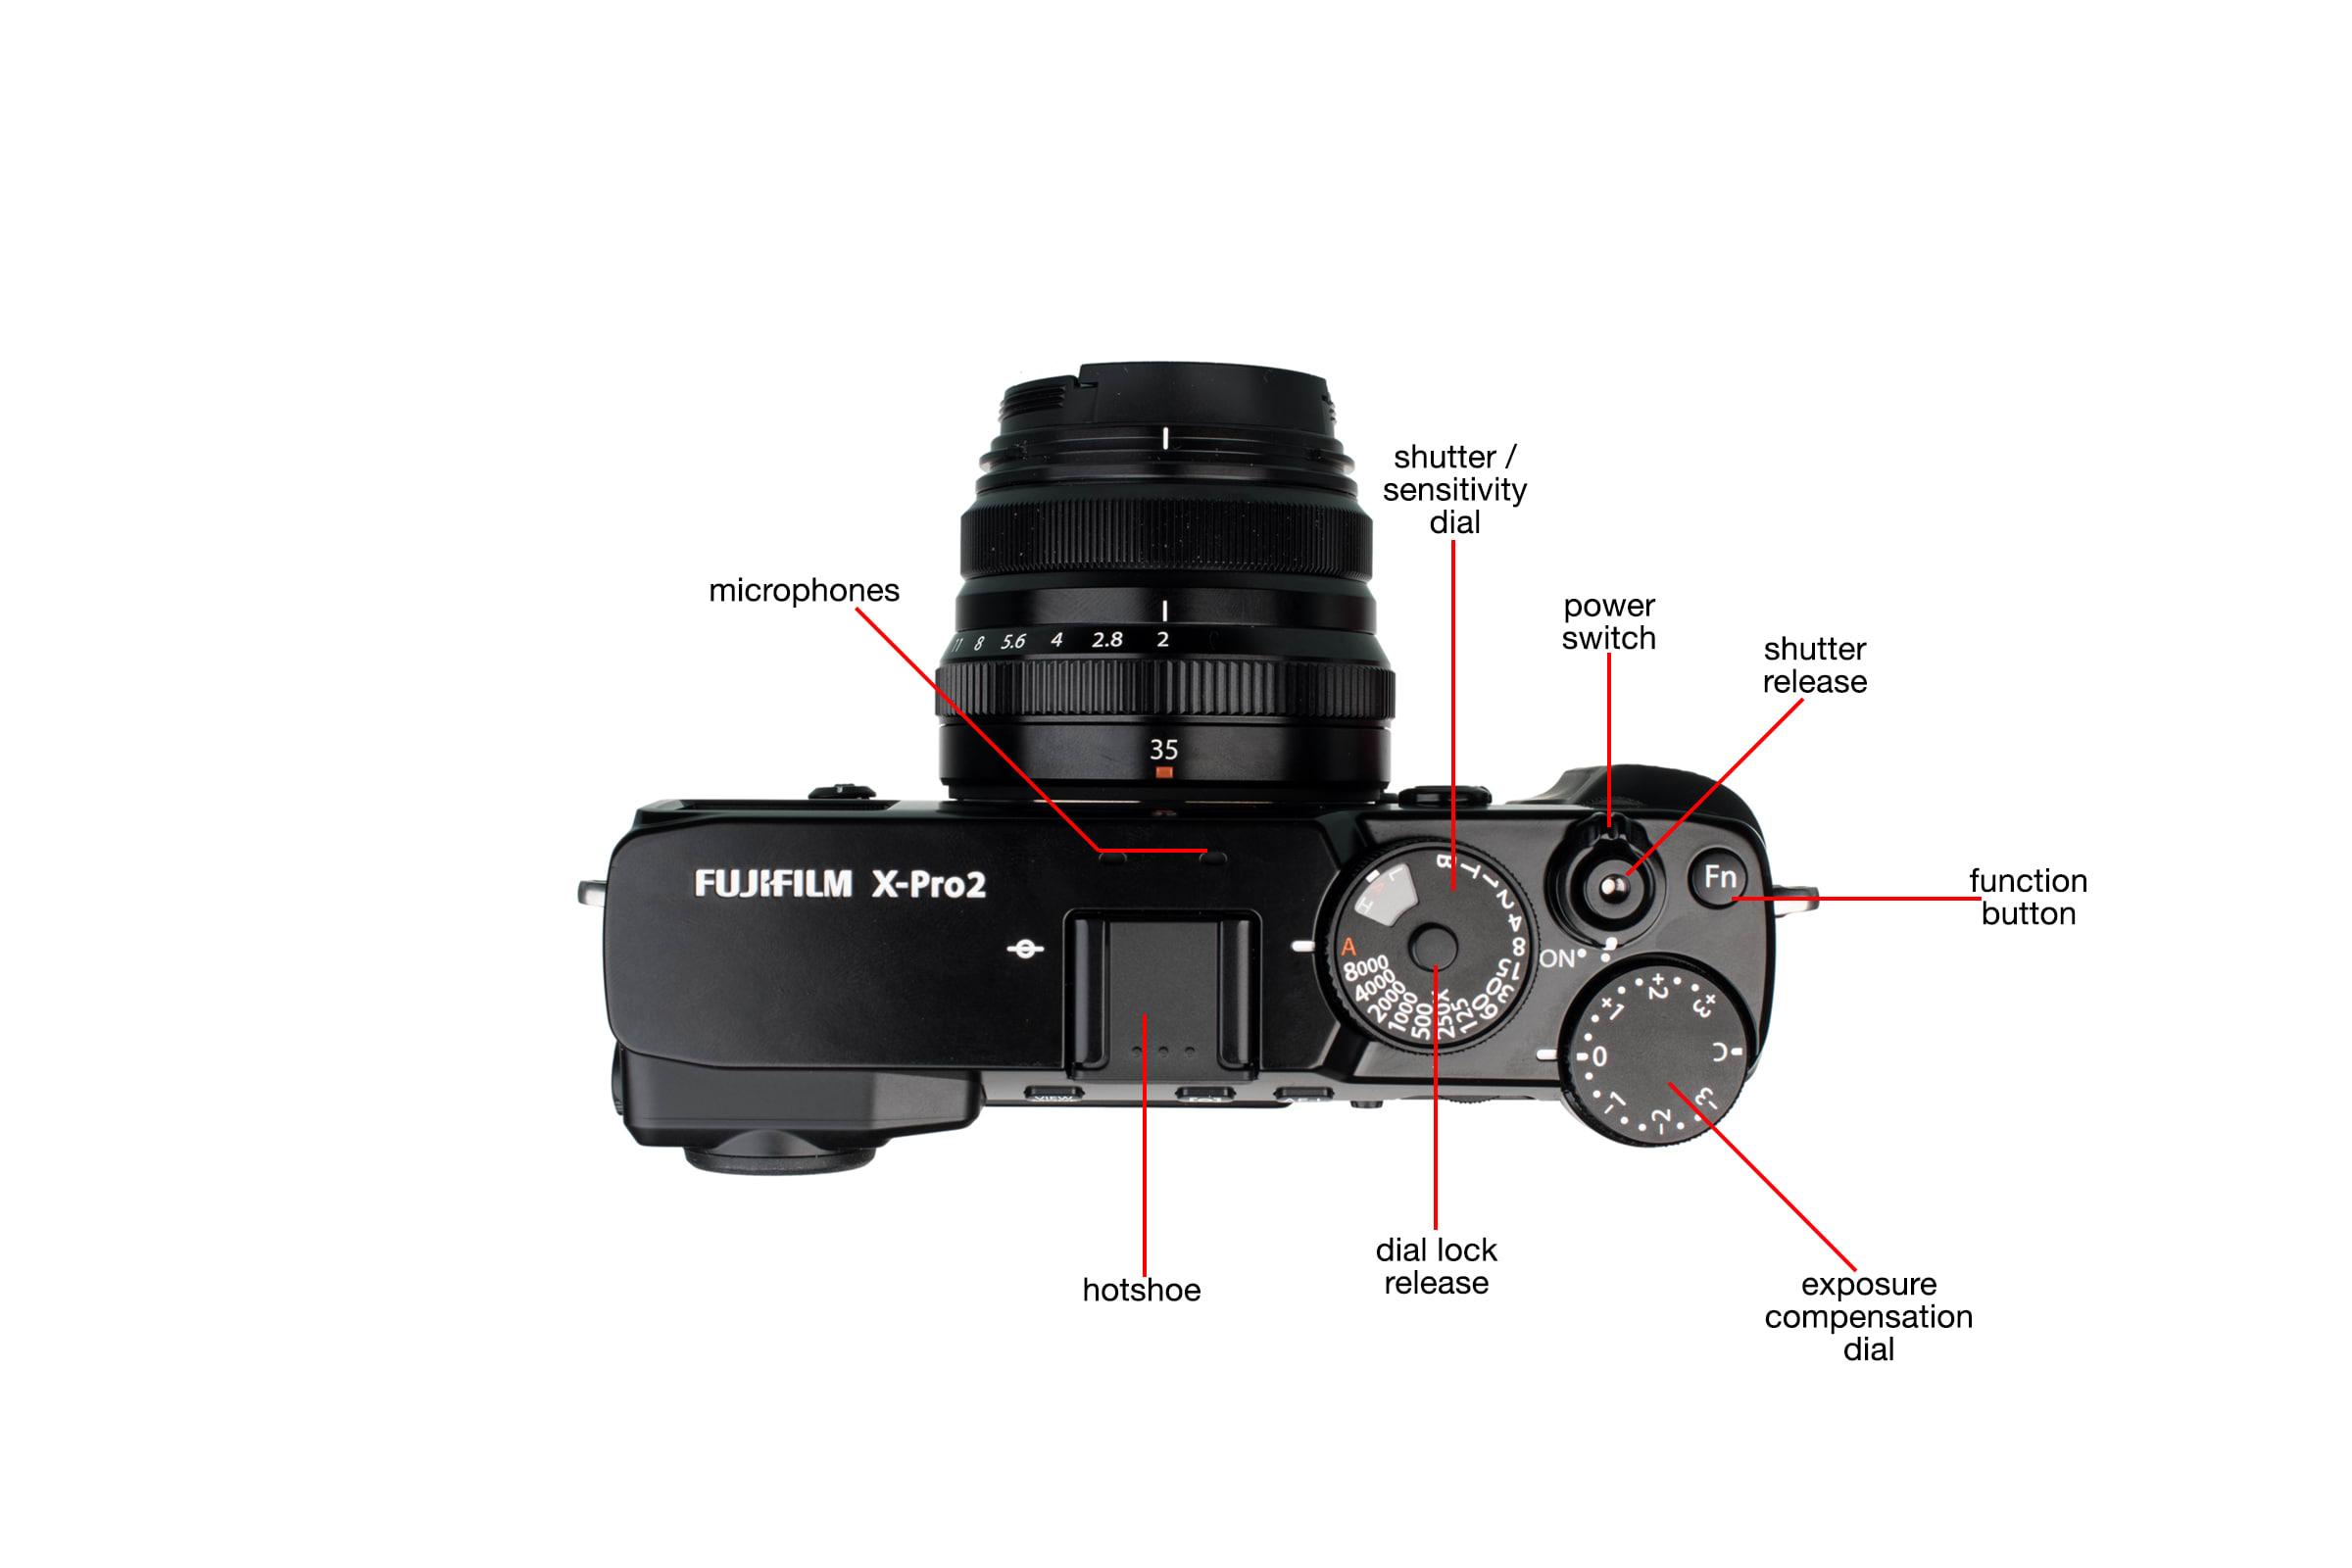 Top view of the Fujifilm X-Pro2.